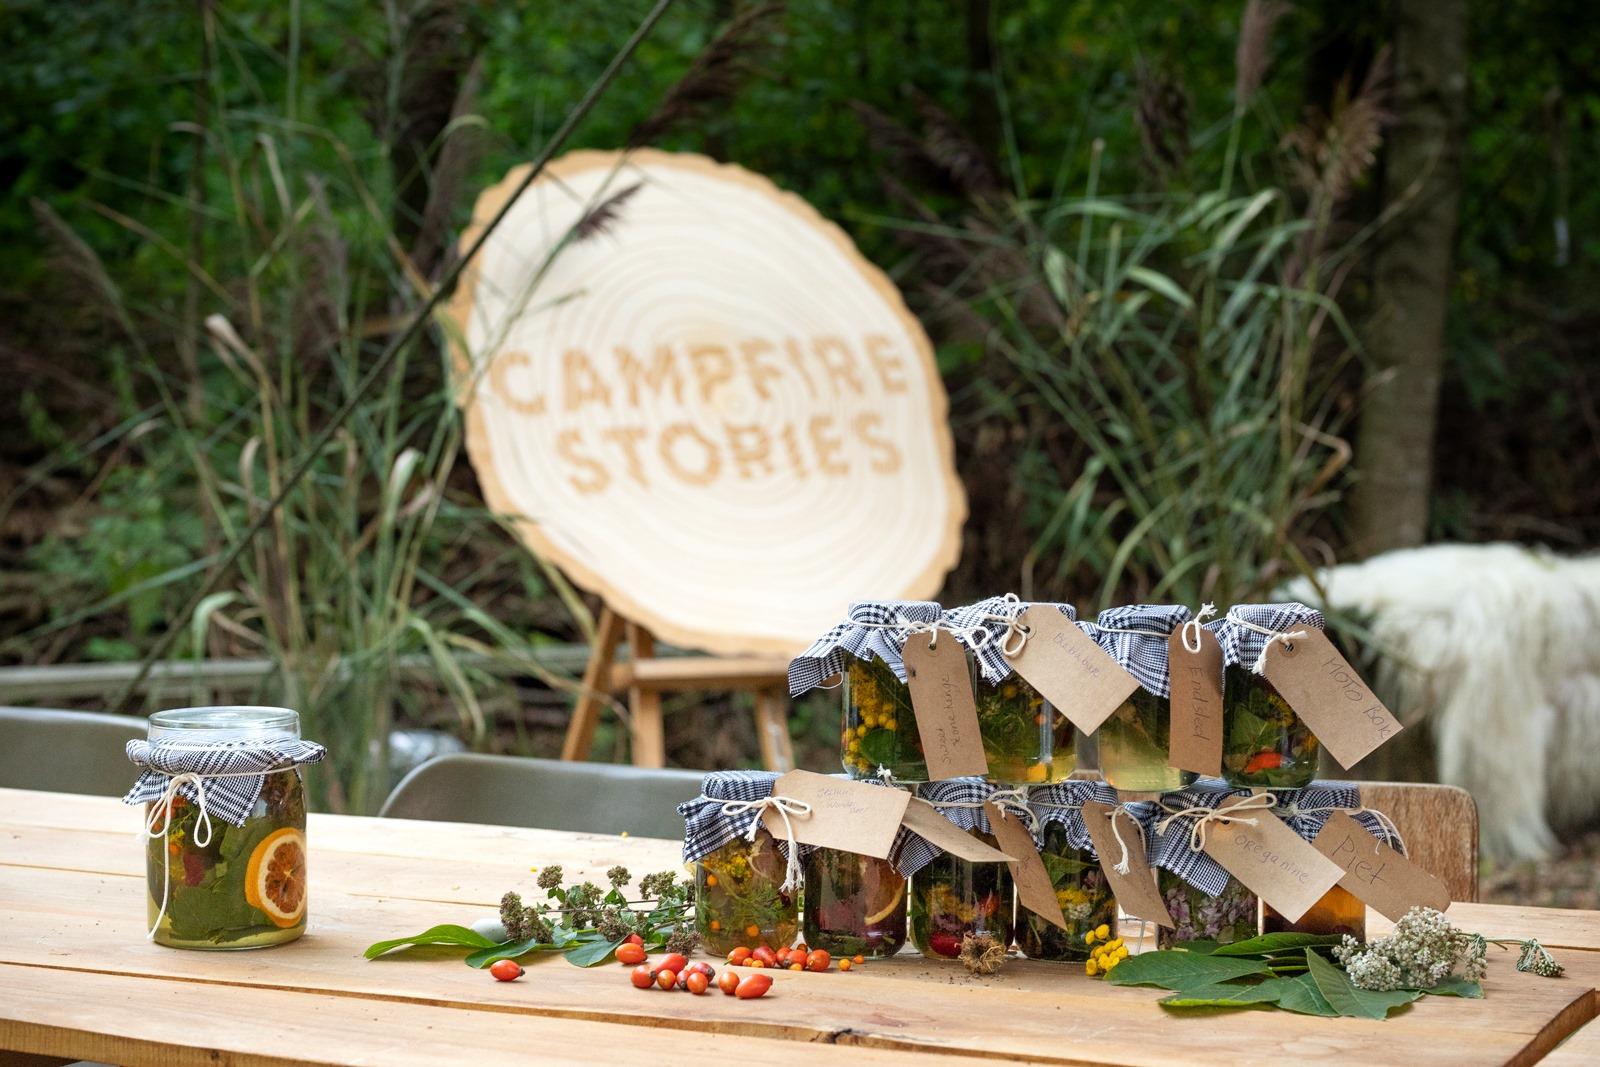 campfirestories maidie van den bos